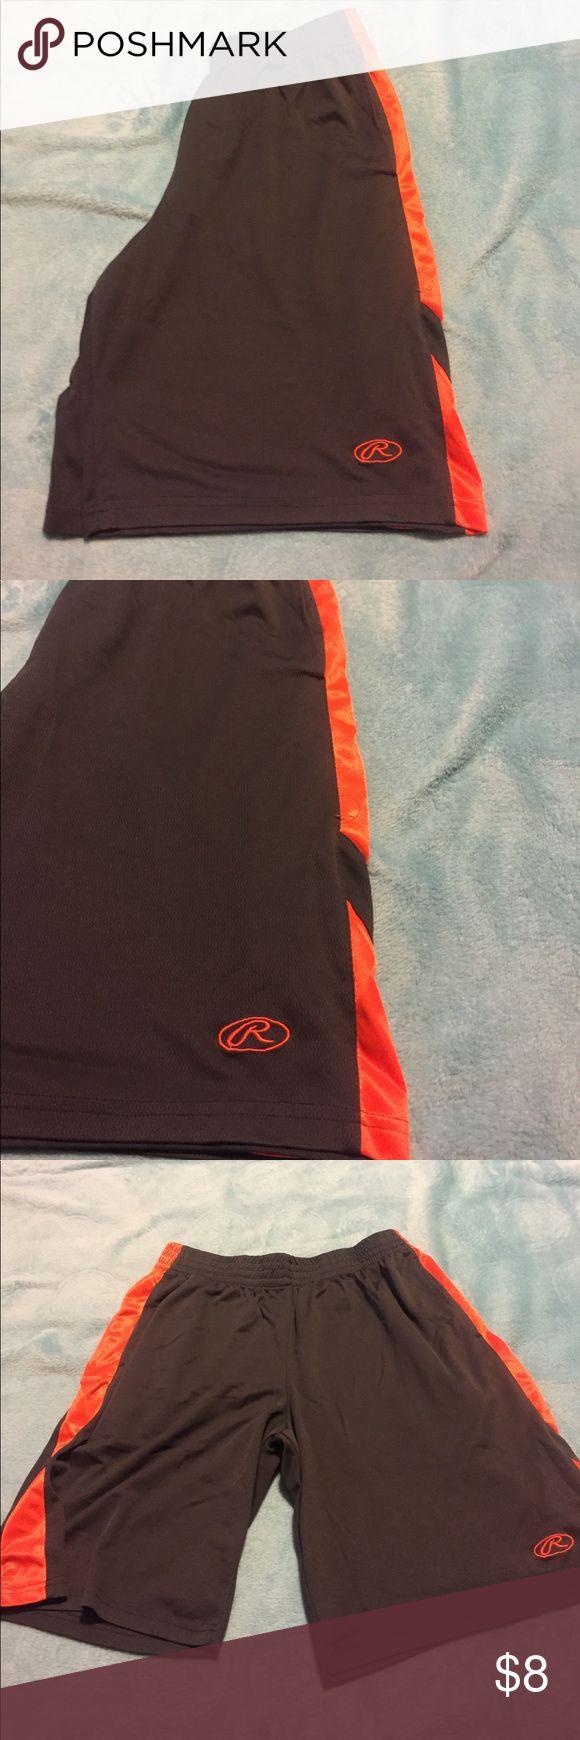 Men's gym shorts Men's gym shorts.       Gray and orange.         Size XL.      Good condition Shorts Athletic